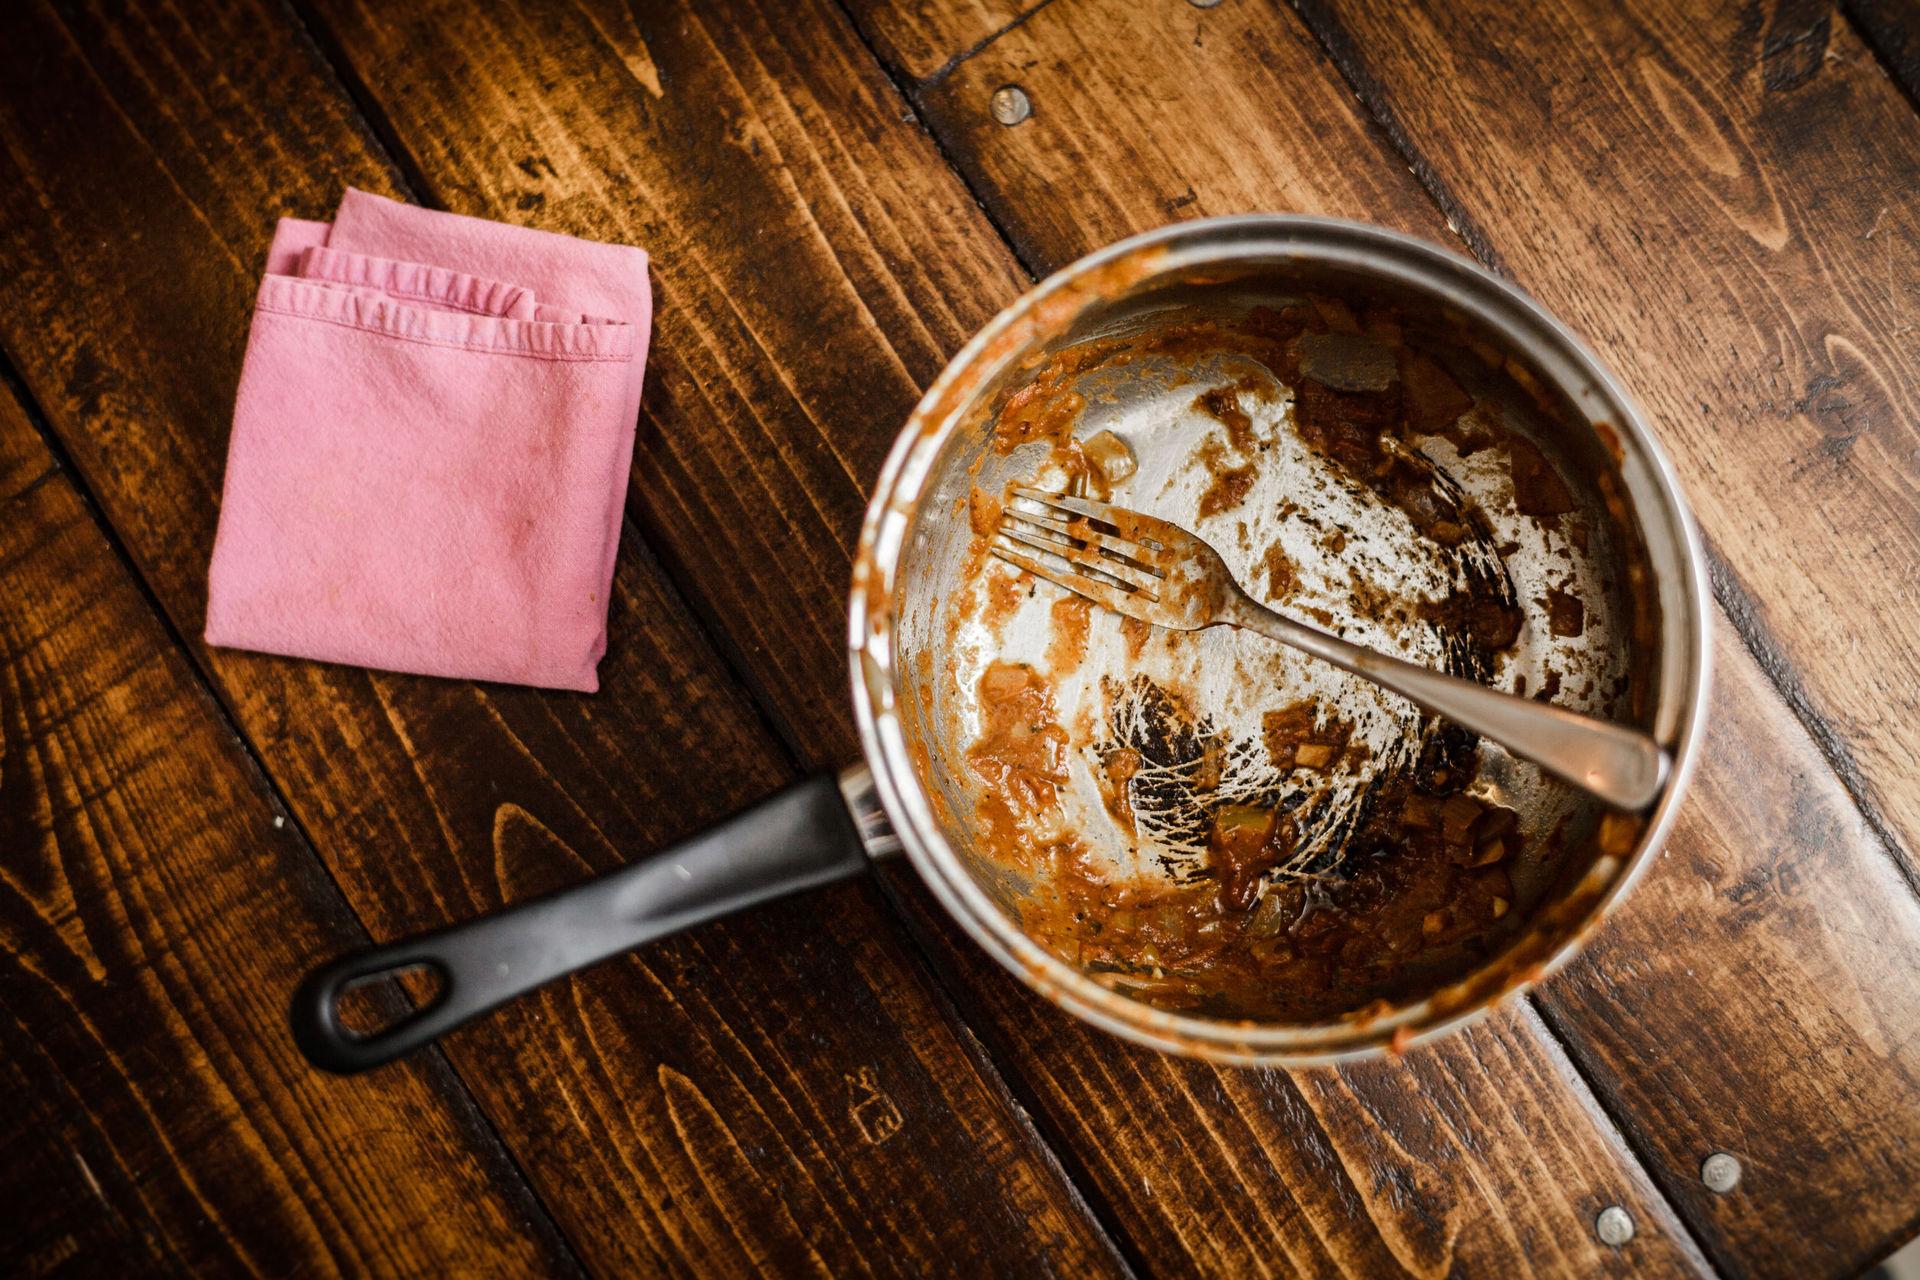 'Zero scrubbing required': Mum's genius tip to get burnt rice off the pan